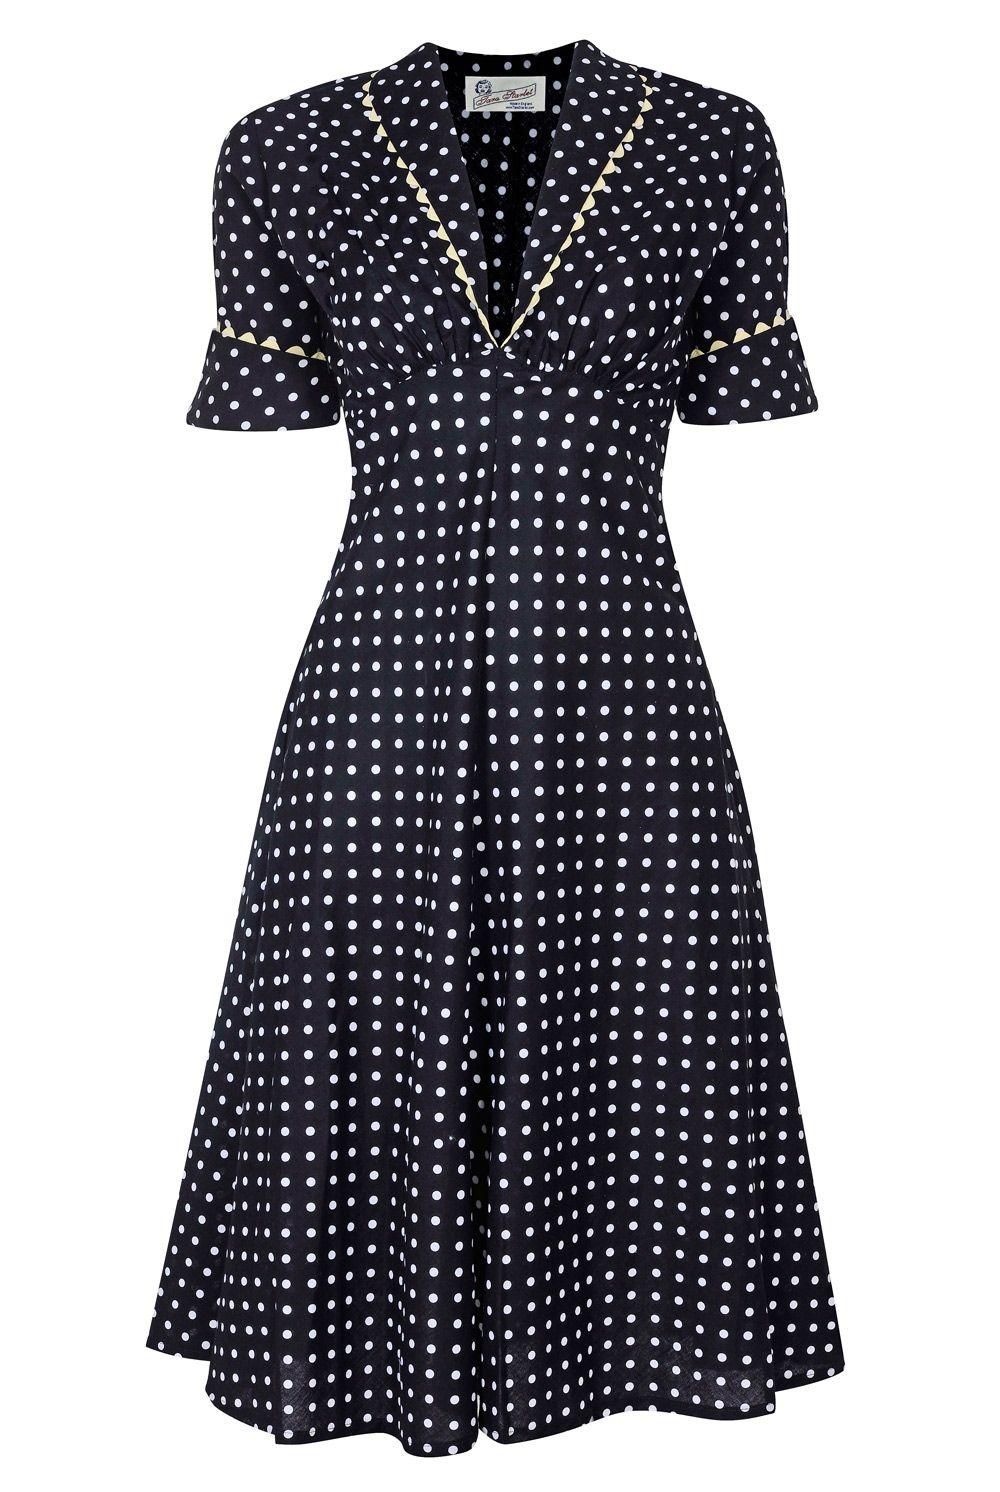 Tara Starlet 1940s 40s Style: Classic Starlet Dress, By Tara Starlet (www.tarastarlet